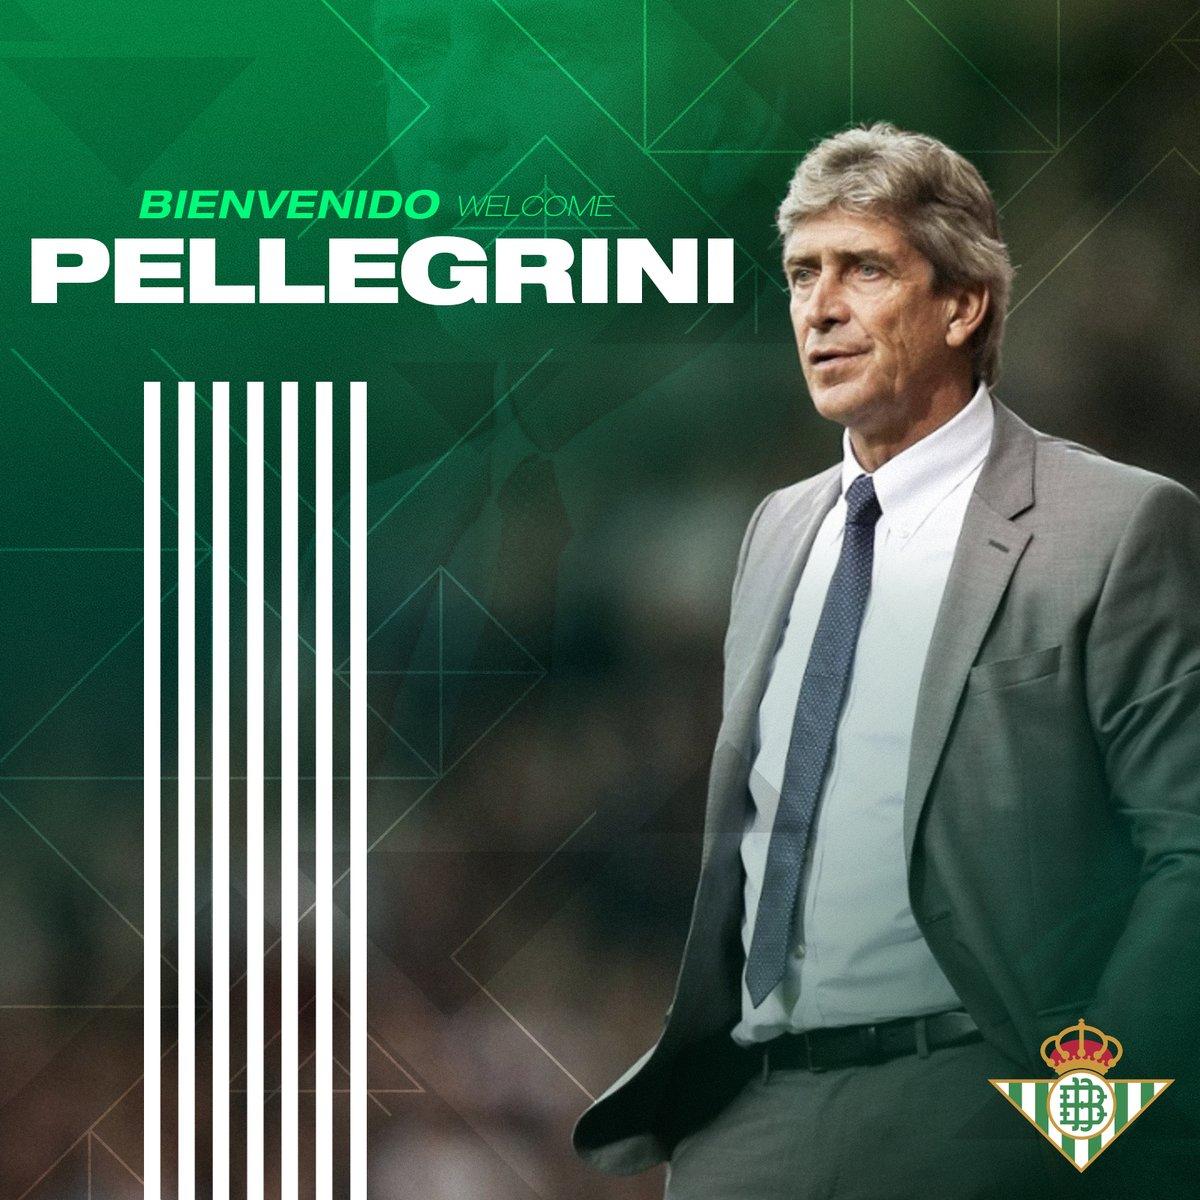 📣 OFICIAL | Manuel Pellegrini, entrenador del #RealBetis a partir de la próxima temporada 🤝🆕💚  ¡Bienvenido! 👋🇨🇱  ➡ https://t.co/Yn8vyu9gO1 https://t.co/CcVAJ2QgEX